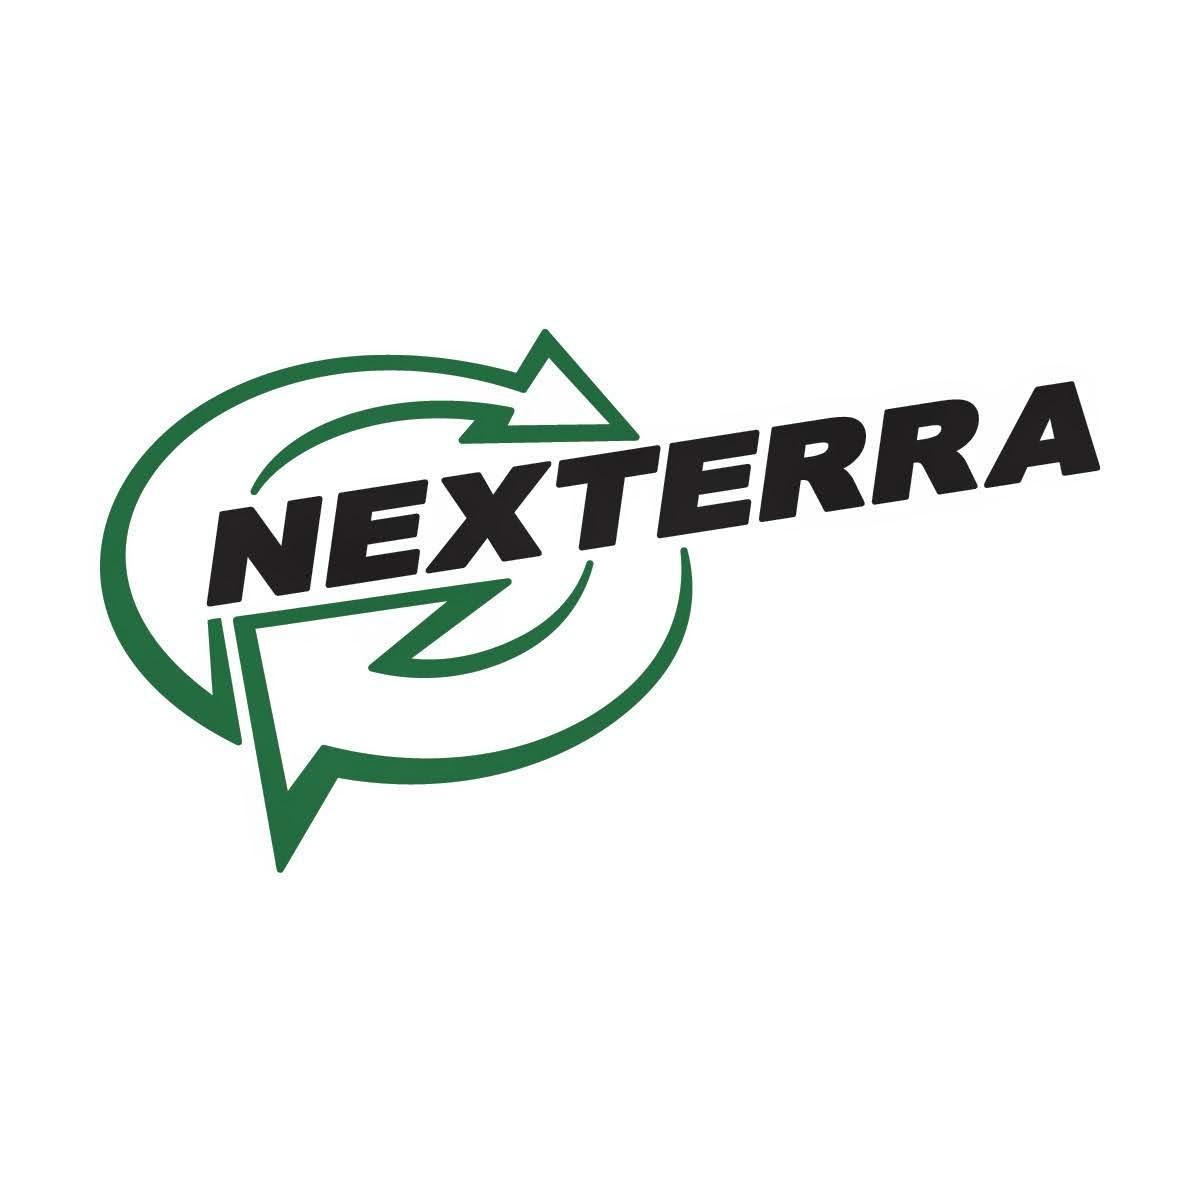 Nexterra.jpg